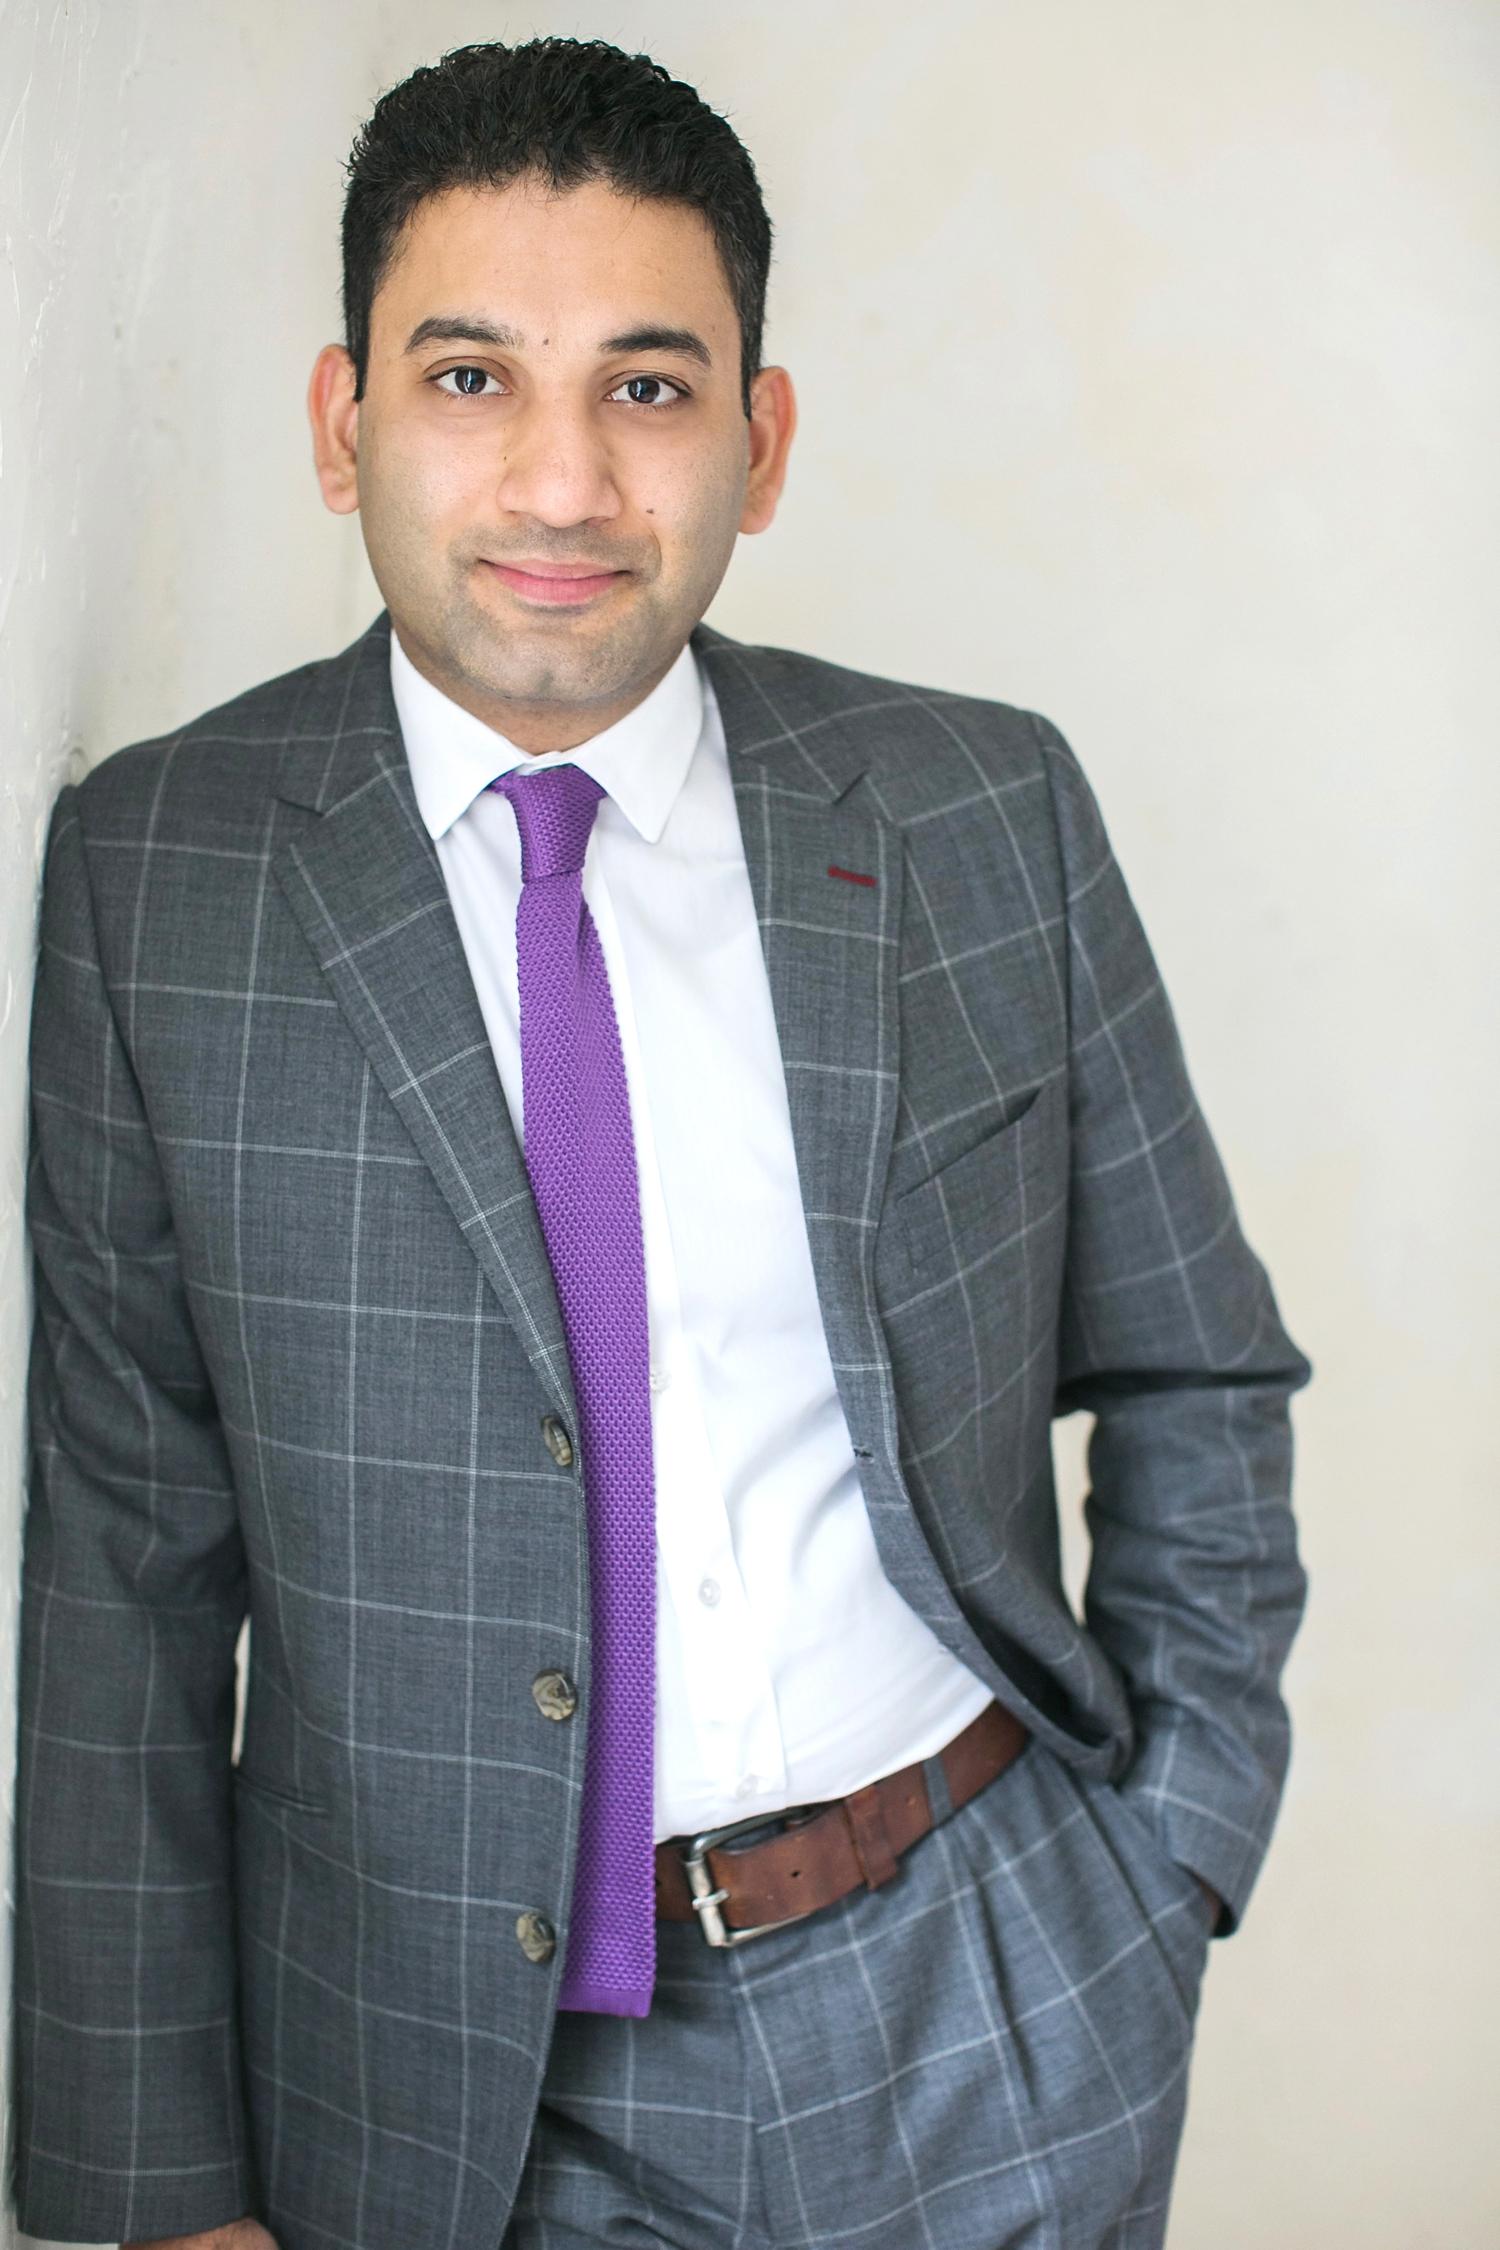 redlands-professional-business-headshot-branding-photographer-carrie-vines-_0022.jpg